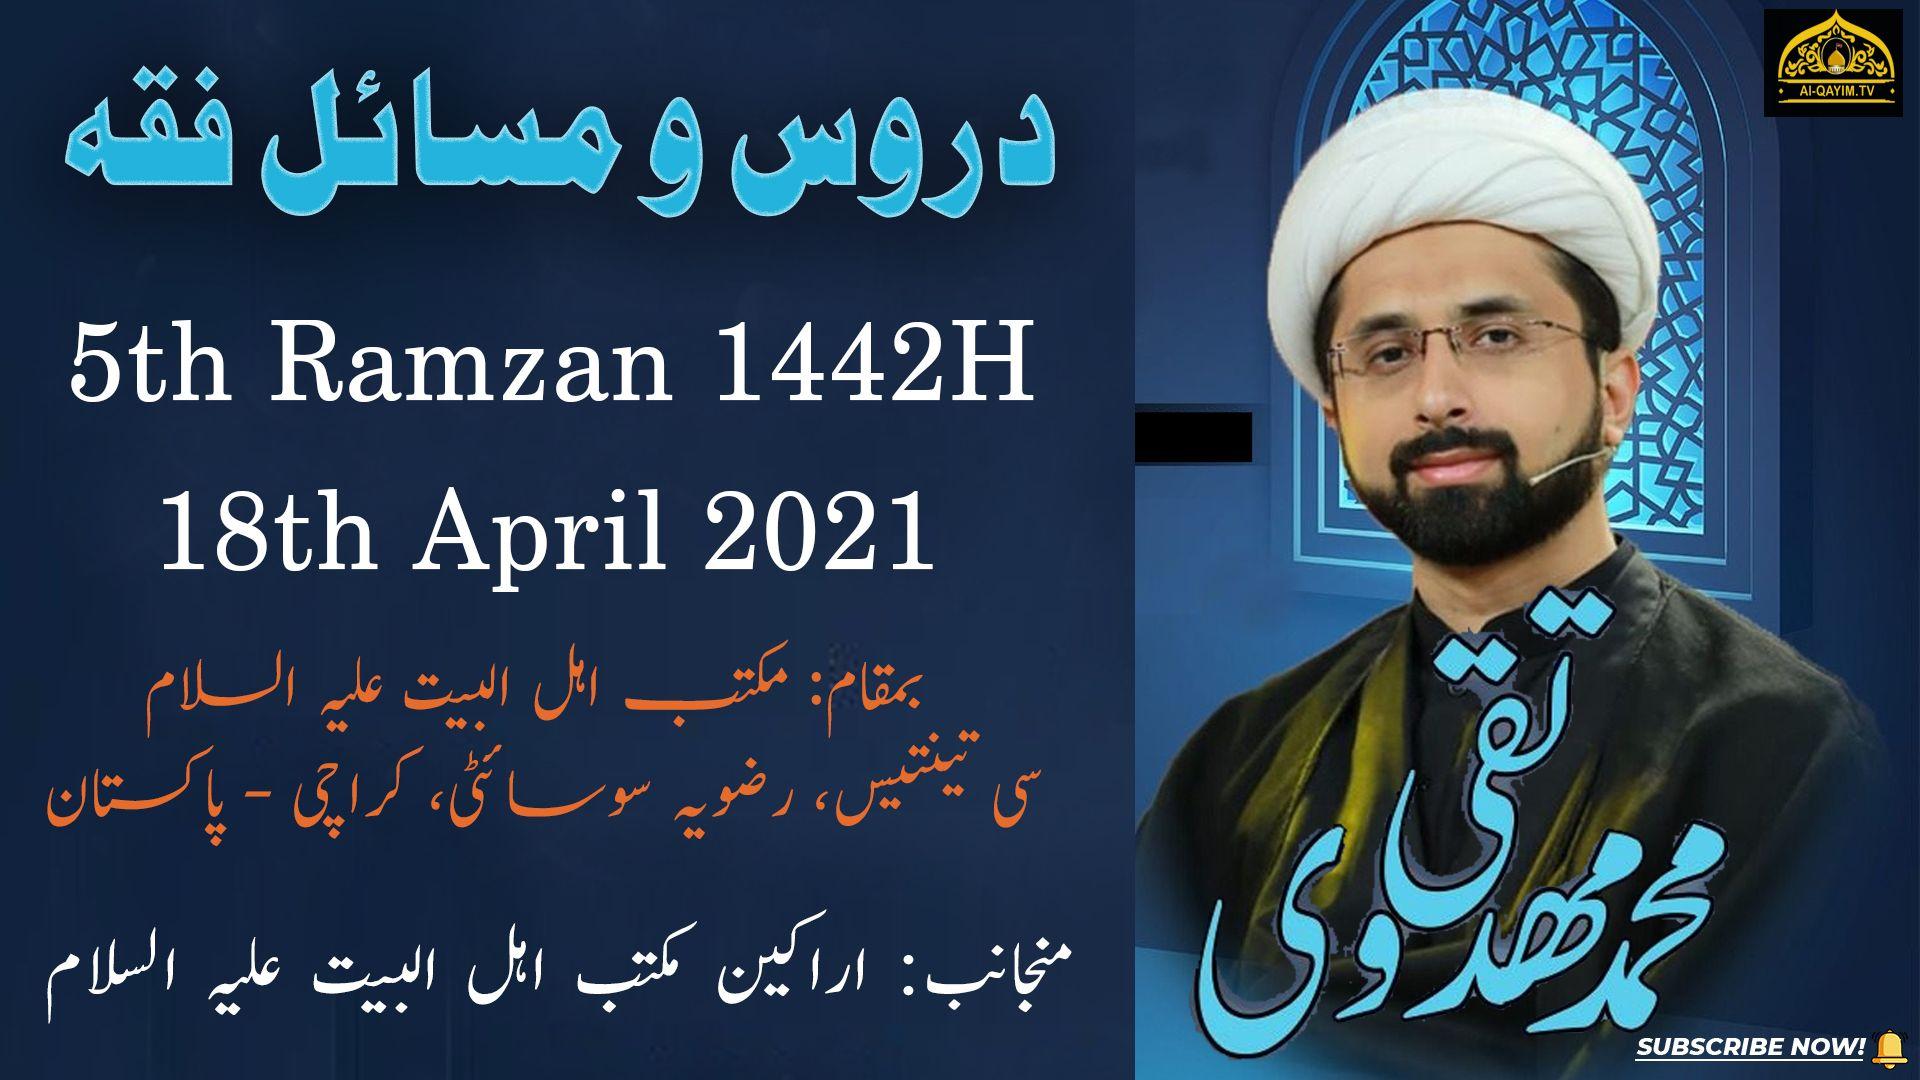 Moulana Muhammad Taqi Mehdavi | Dars Wo Masail Fiqae | 5th Ramzan 2021 | Maktab-e-Ahlebait - Karachi